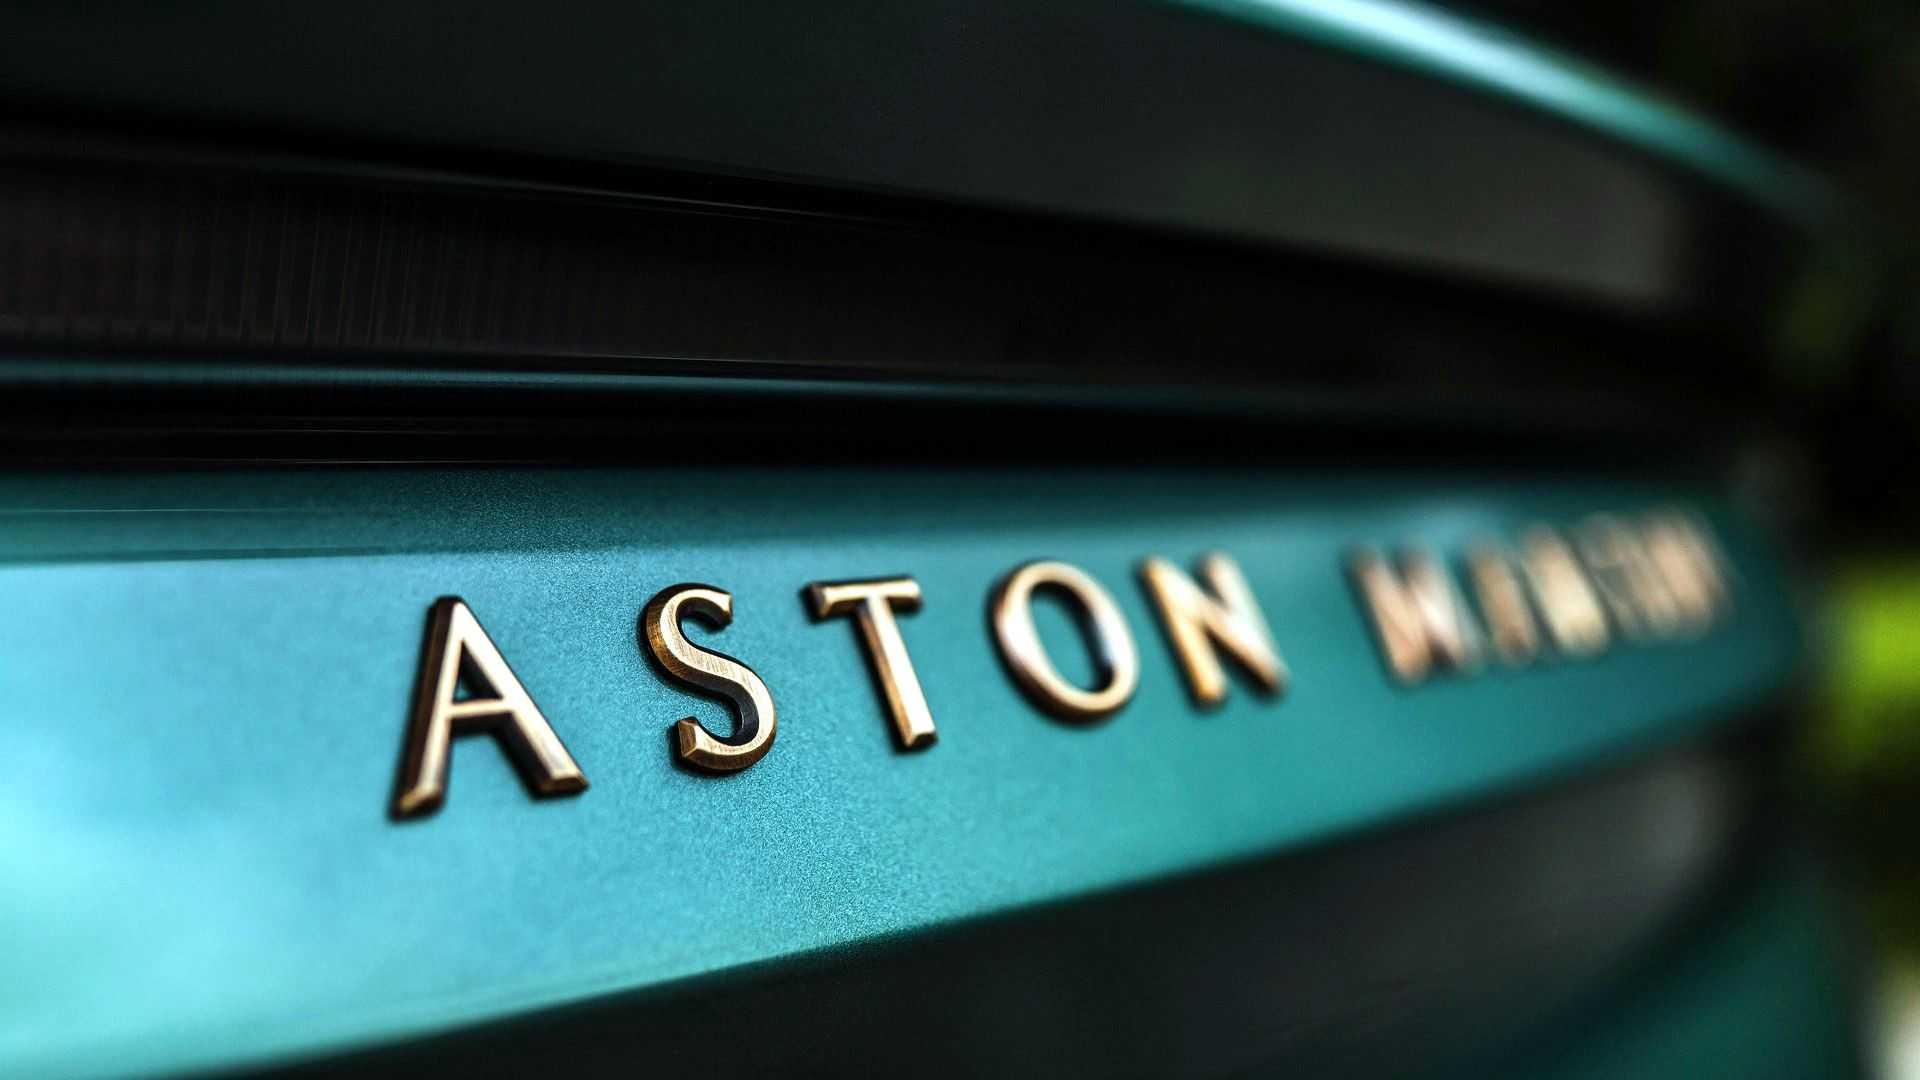 2019 Aston Martin DBS 59 Detail Wallpapers (6)